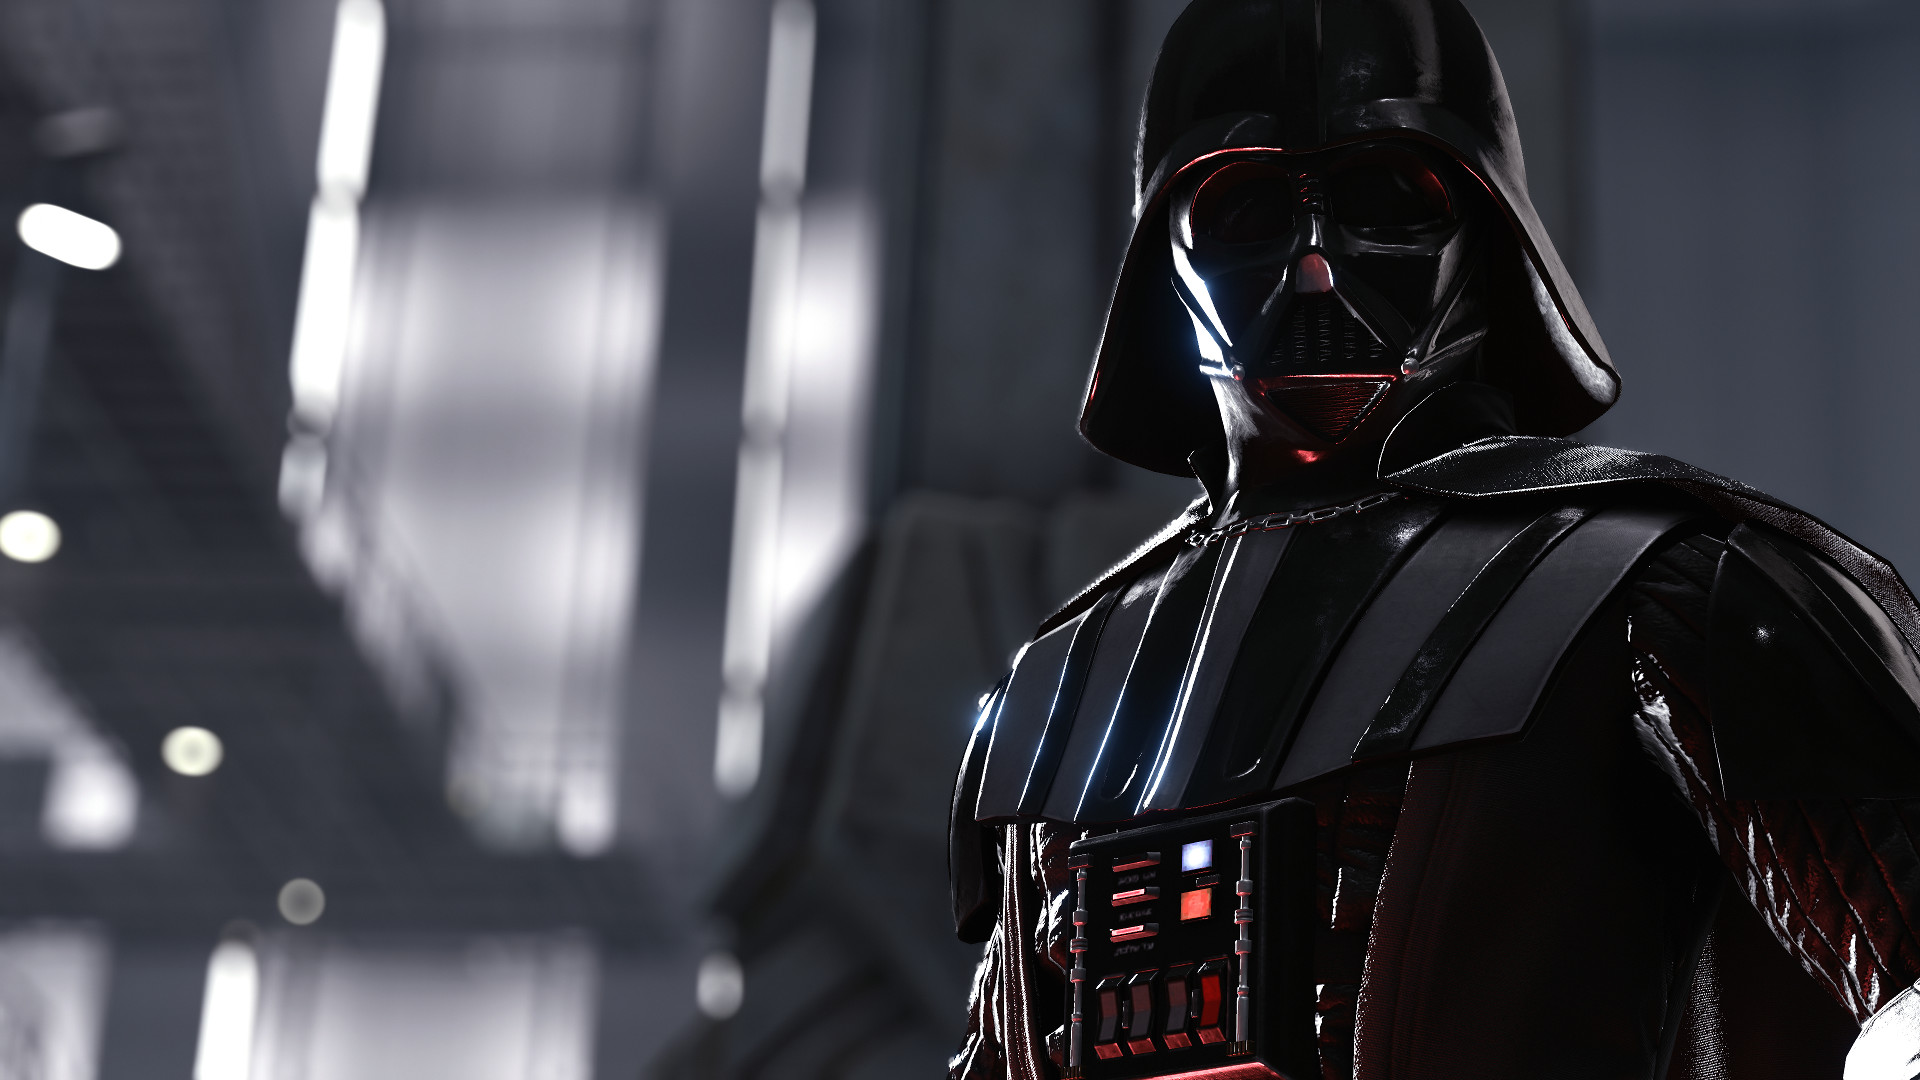 Darth Vader Wallpaper (75+ Images